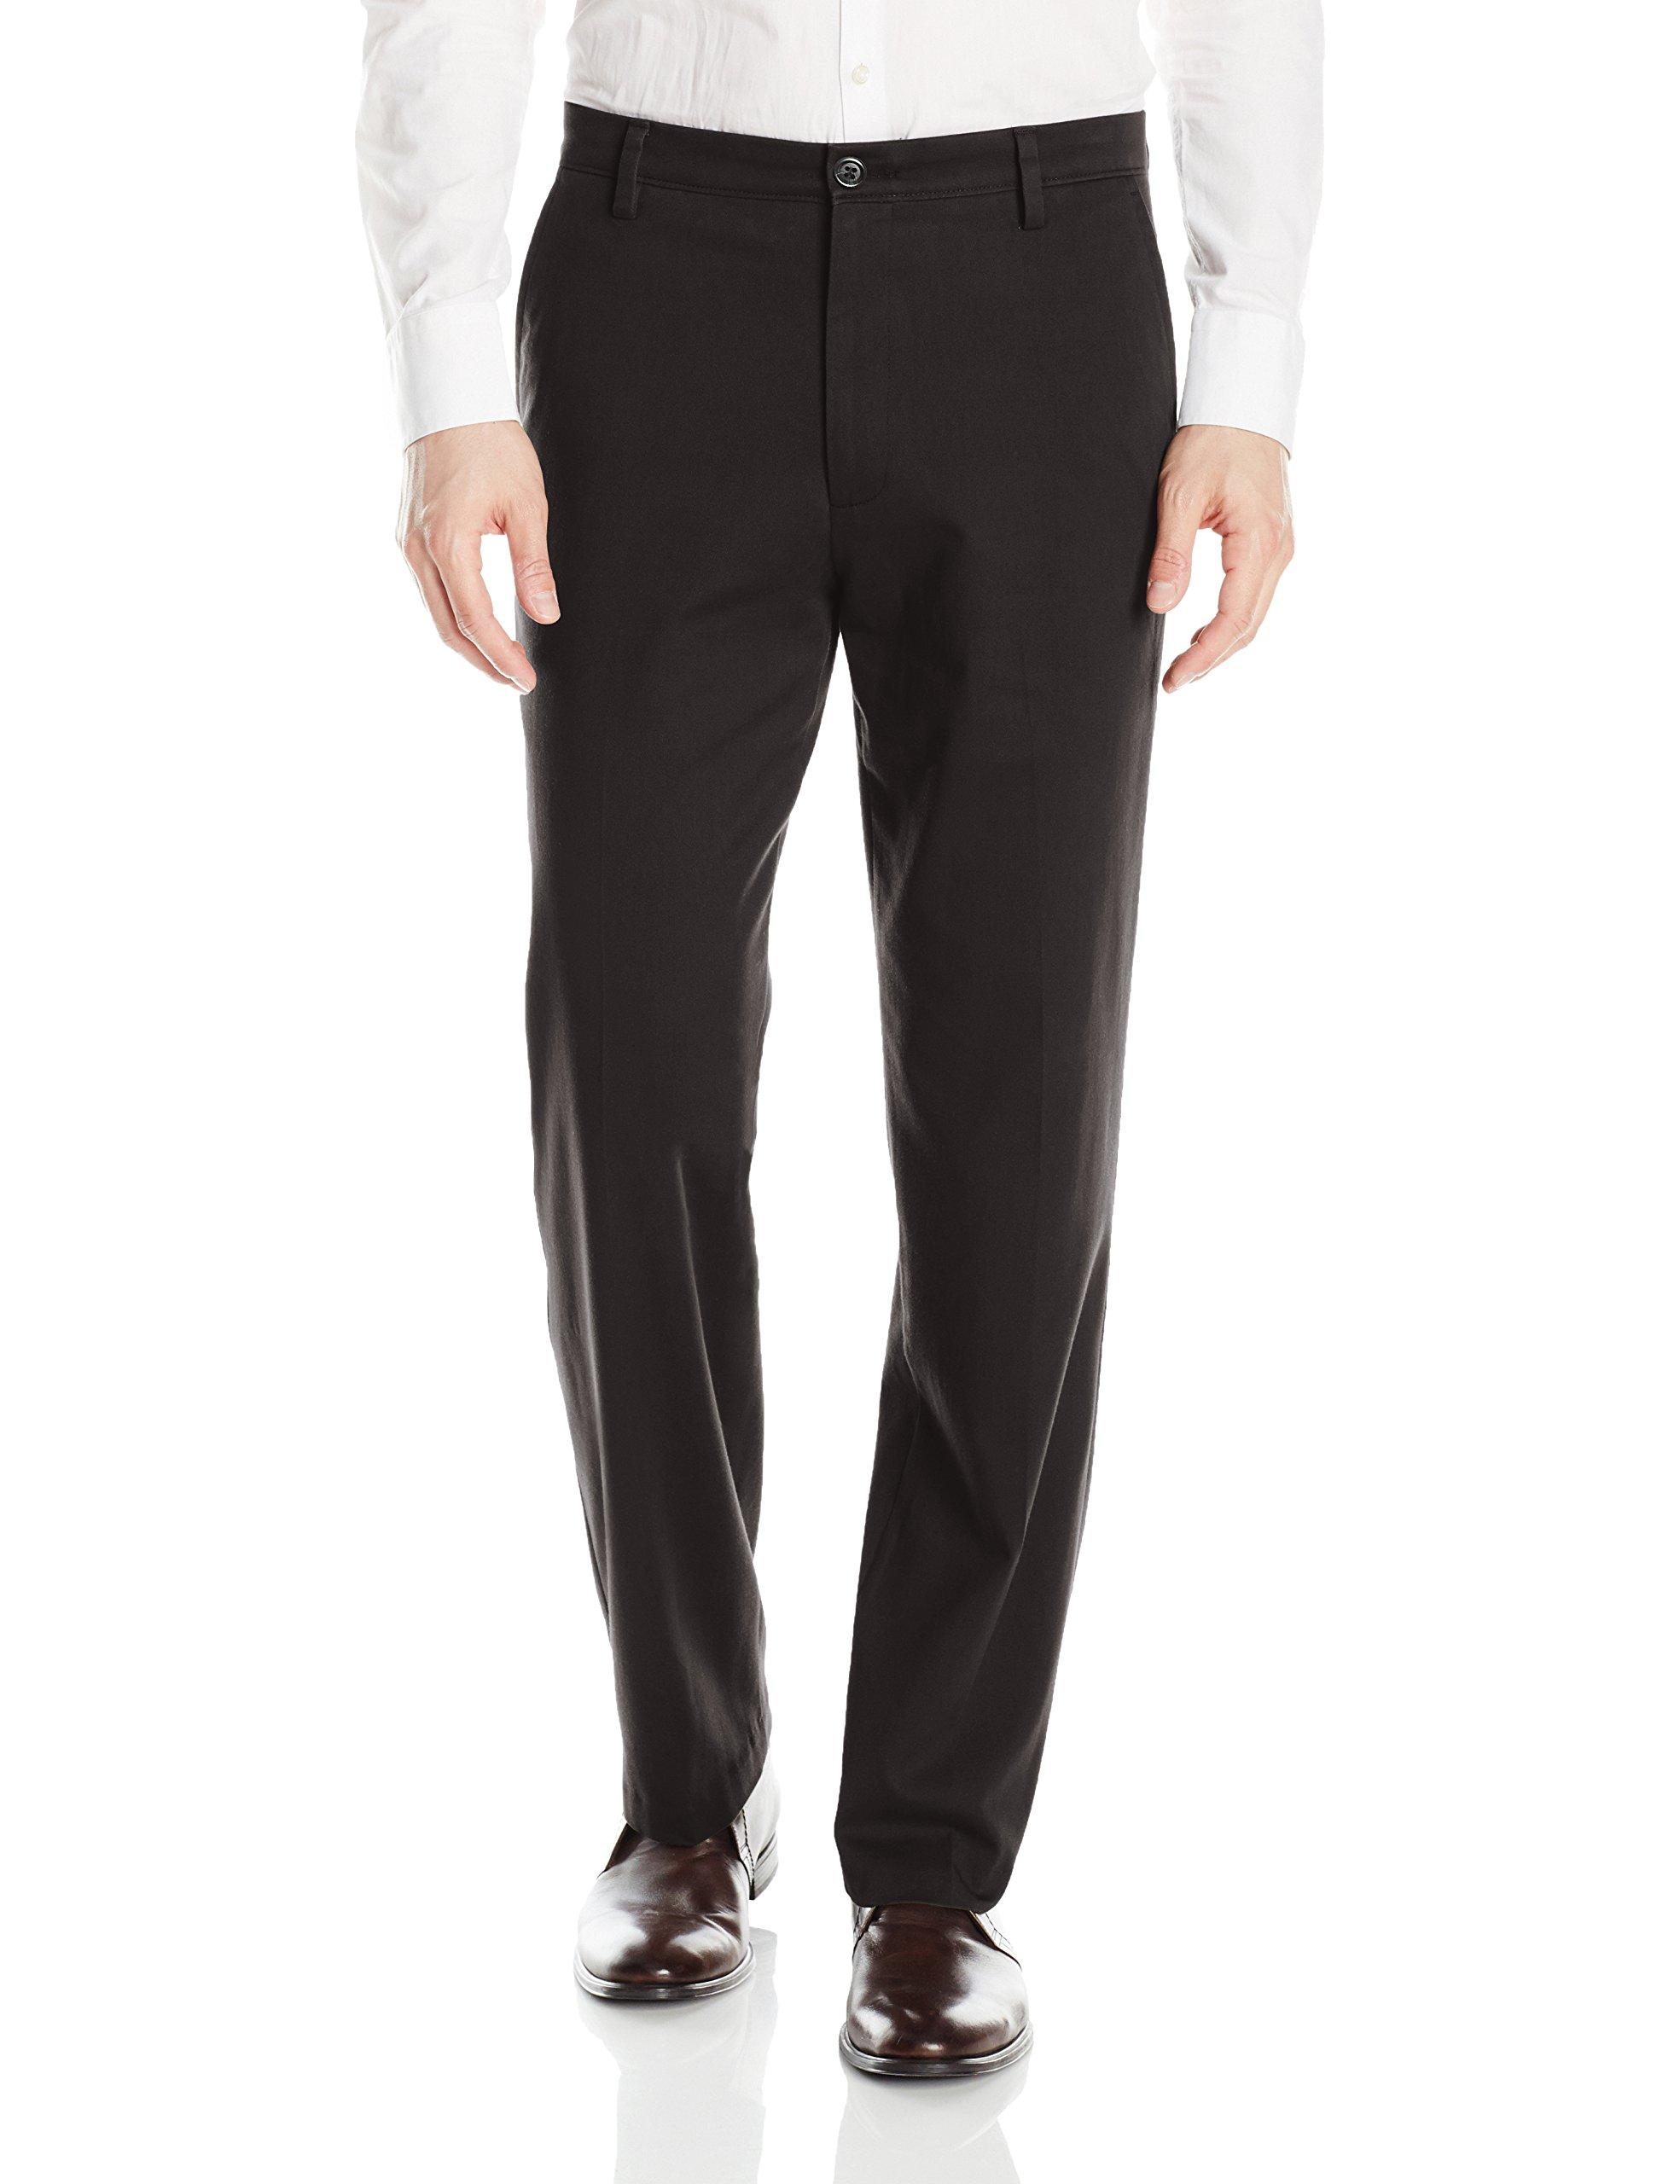 Dockers Easy Khaki D3 Classic-Fit Flat-Front Pant, Black, 40 32